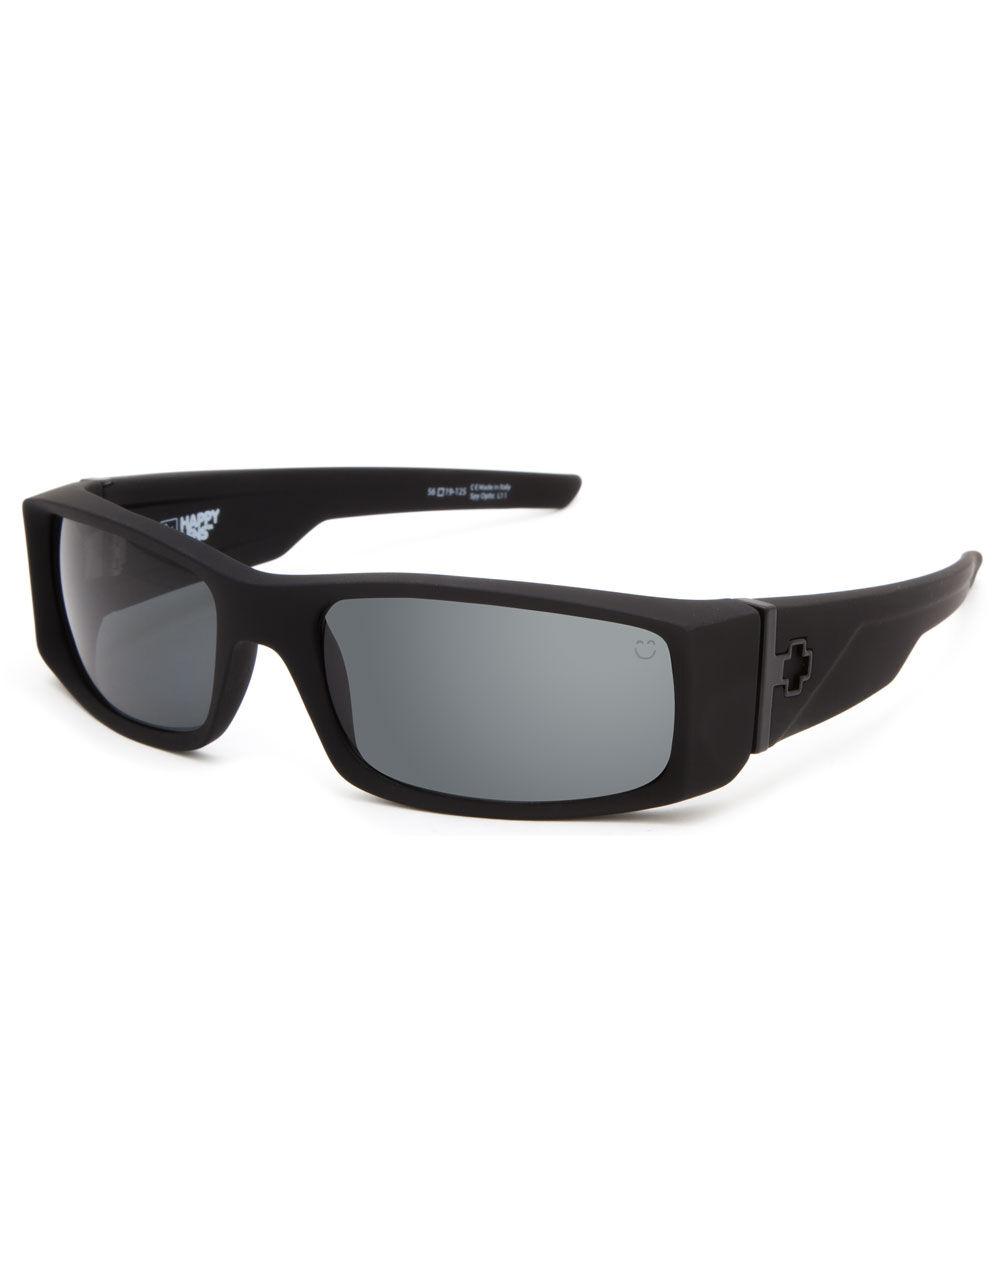 SPY Happy Lens Hielo Sunglasses